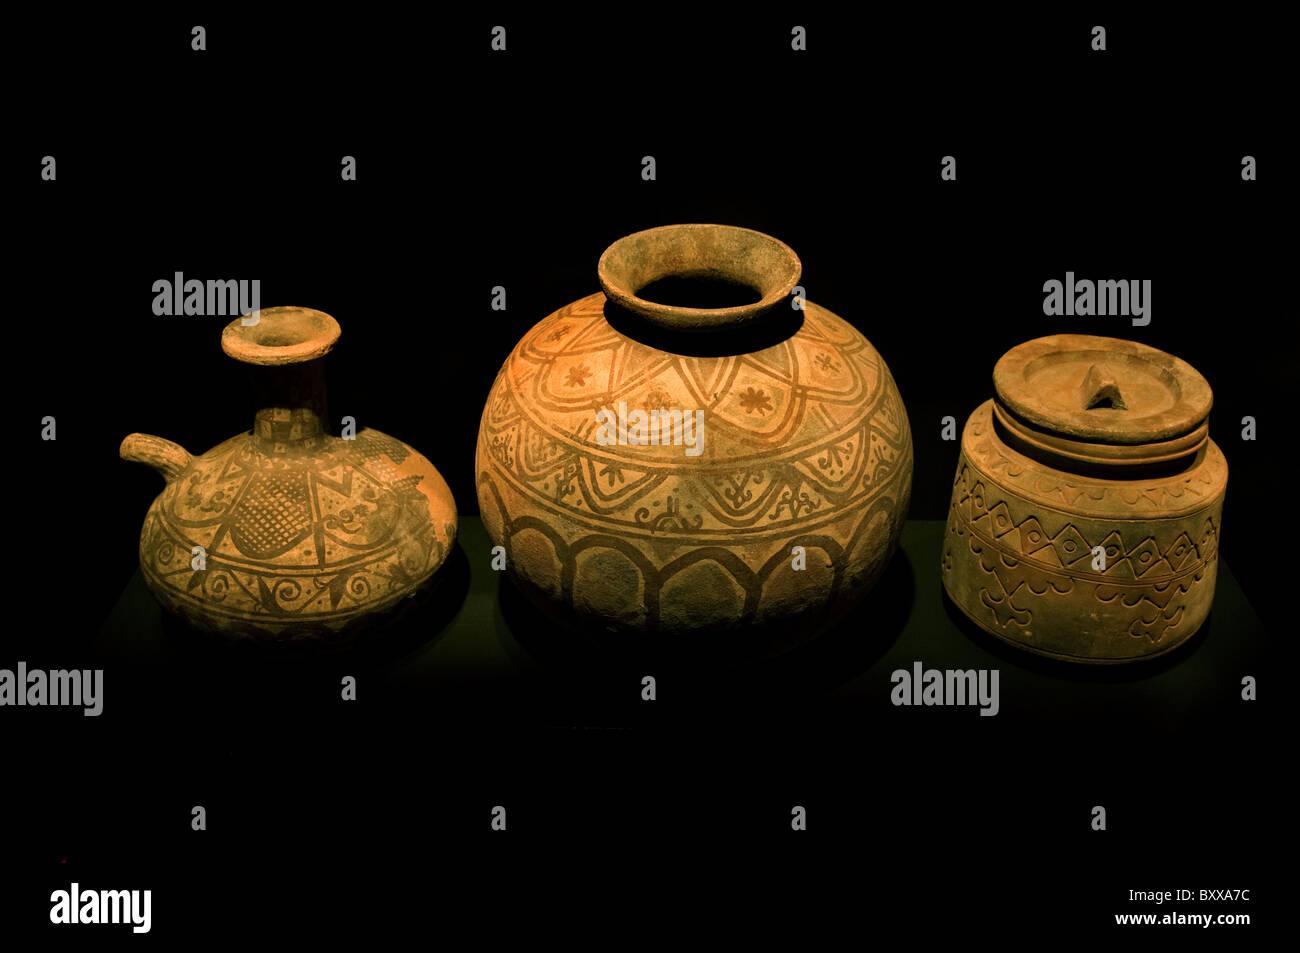 Indonesia Banda indonesiano Maluku Tengah pentole di terracotta Kai Islands prima del 1900 Immagini Stock